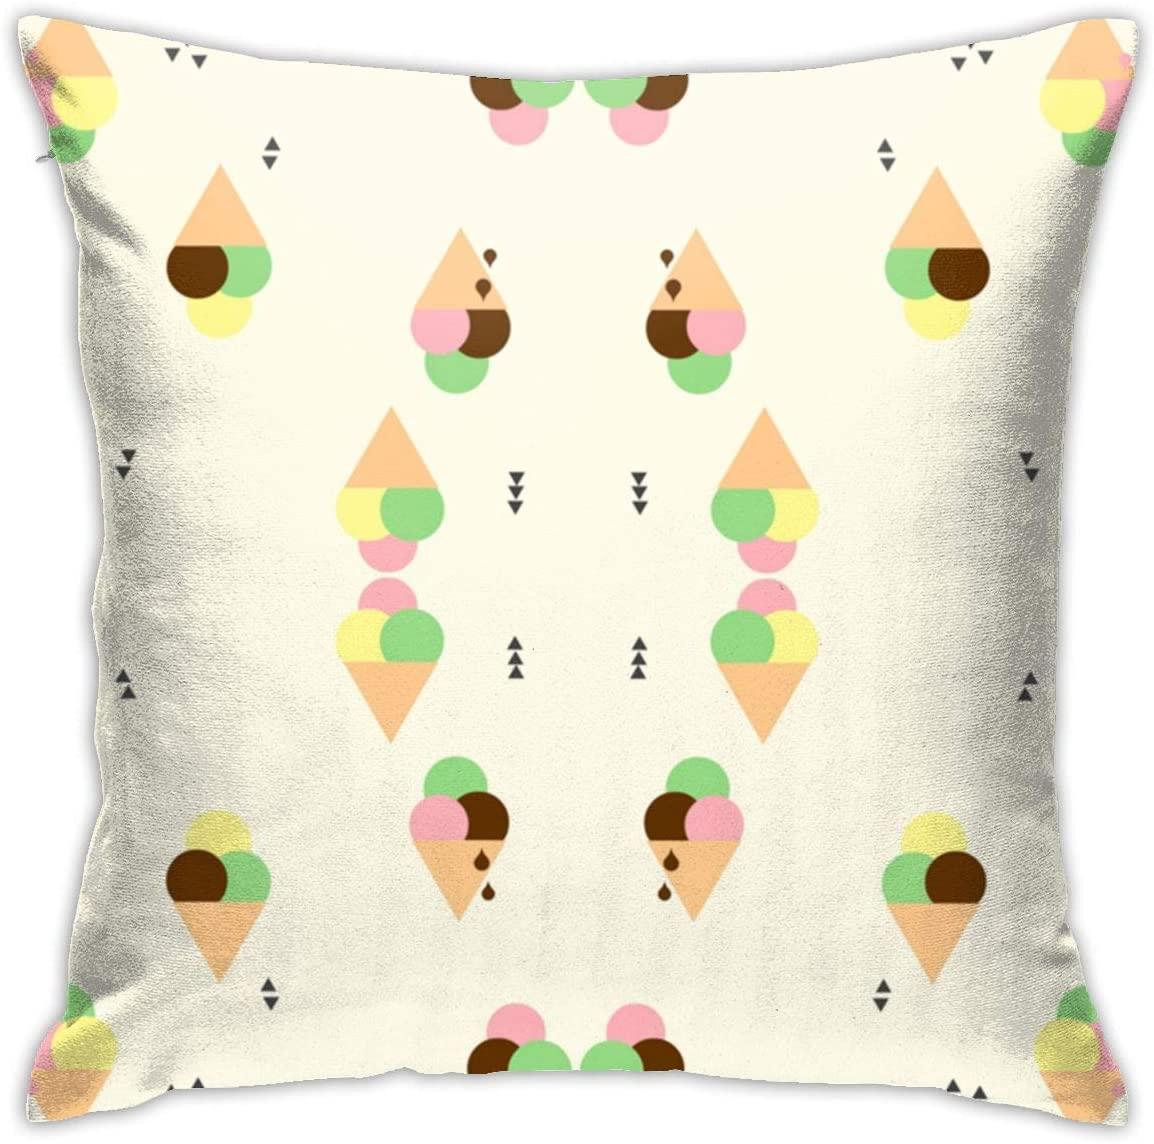 antkondnm Ice Cream Fabric (8328) Throw Pillow Cases Decorative Soft Square Throw Pillow Cover Cushion Case for Sofa